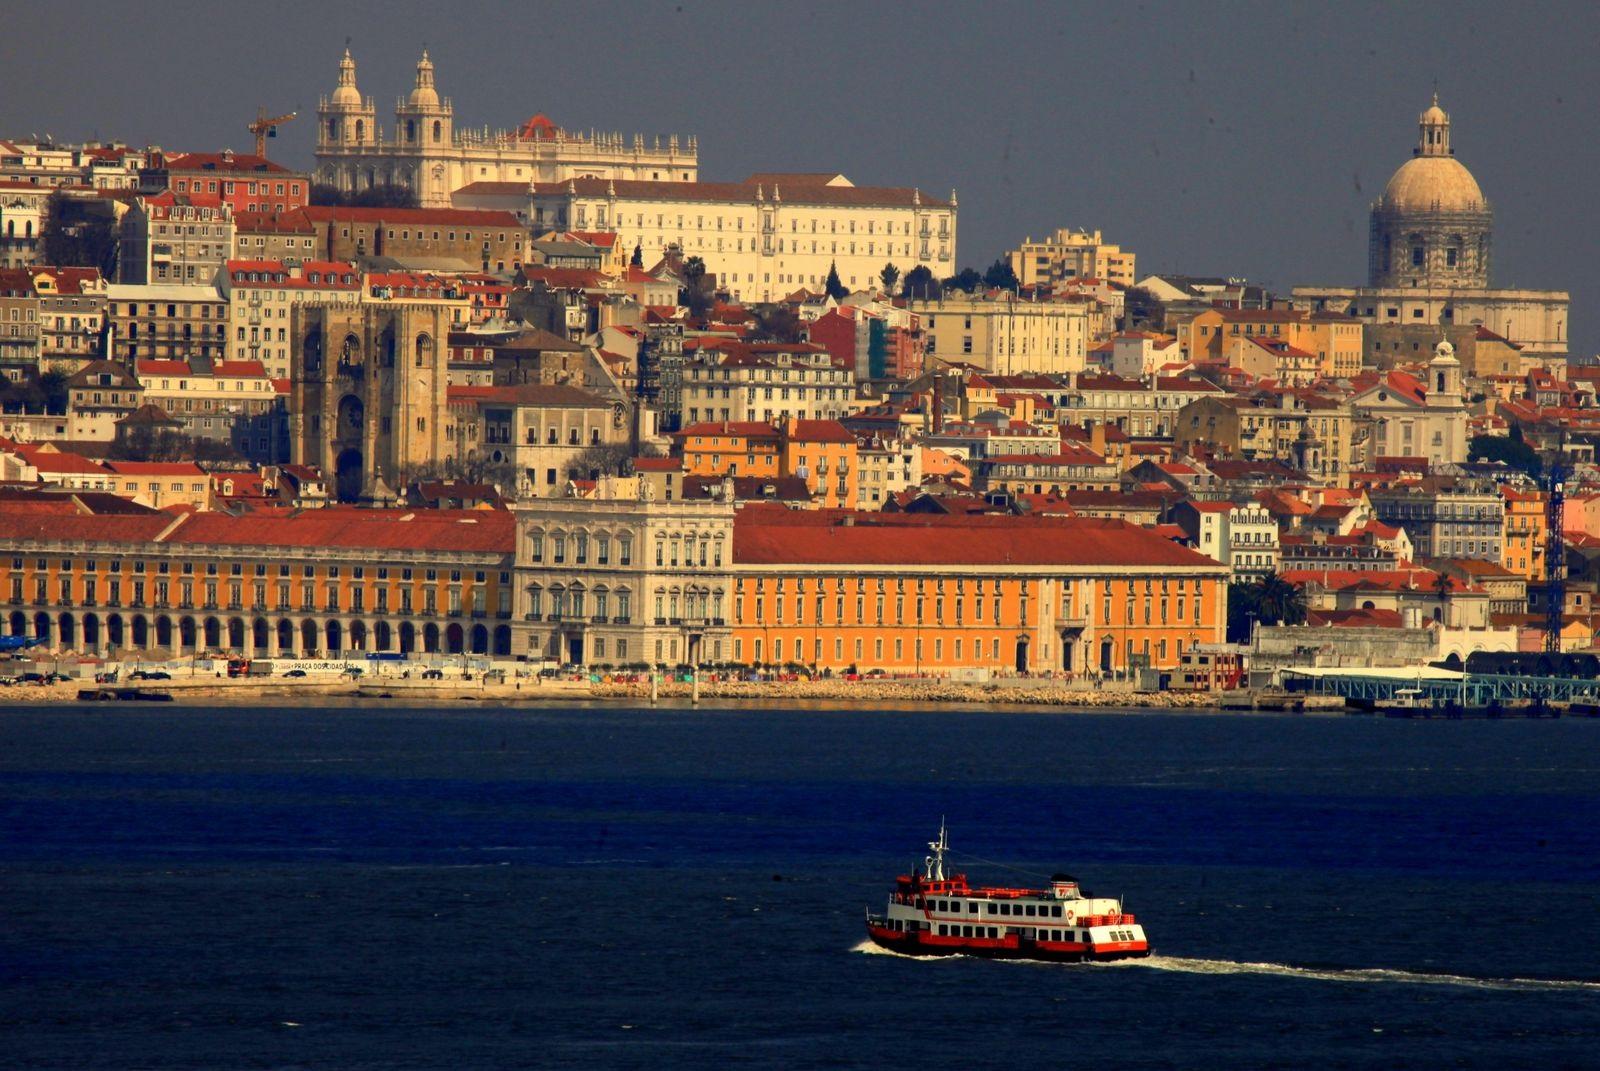 Day_2_-_Lisbon_view[1].jpg